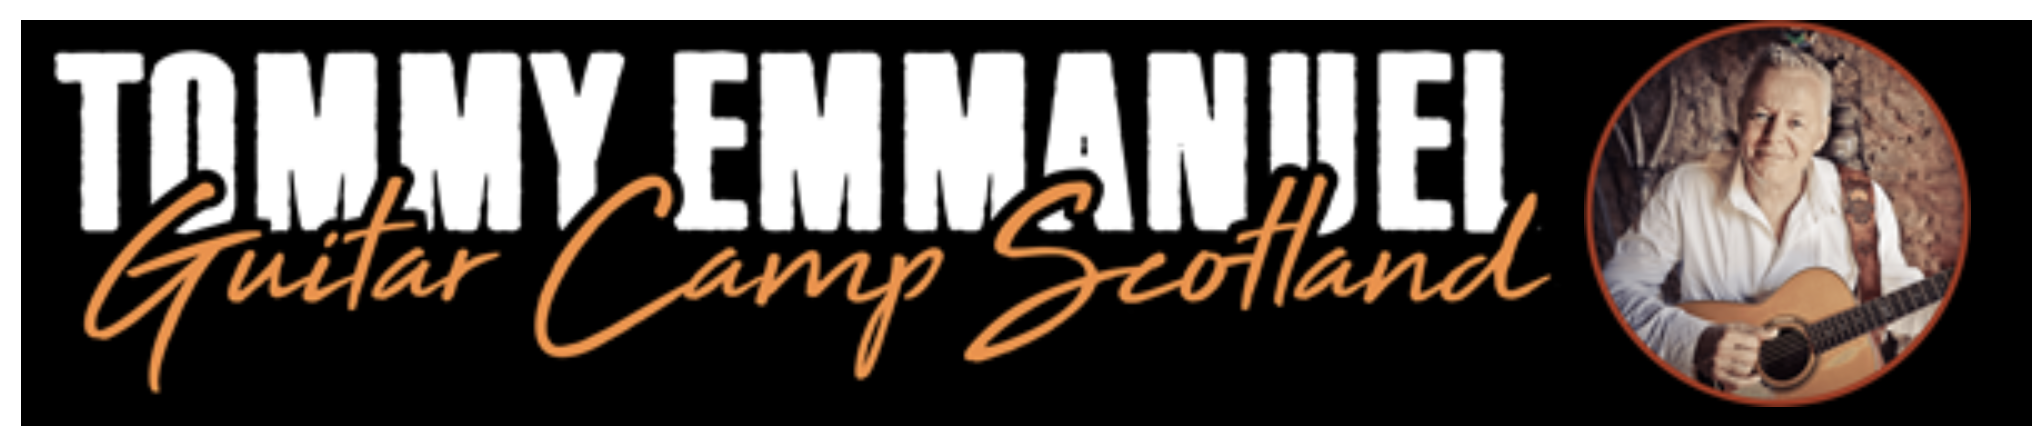 www.tommyemmanuelguitarcampscotland.com